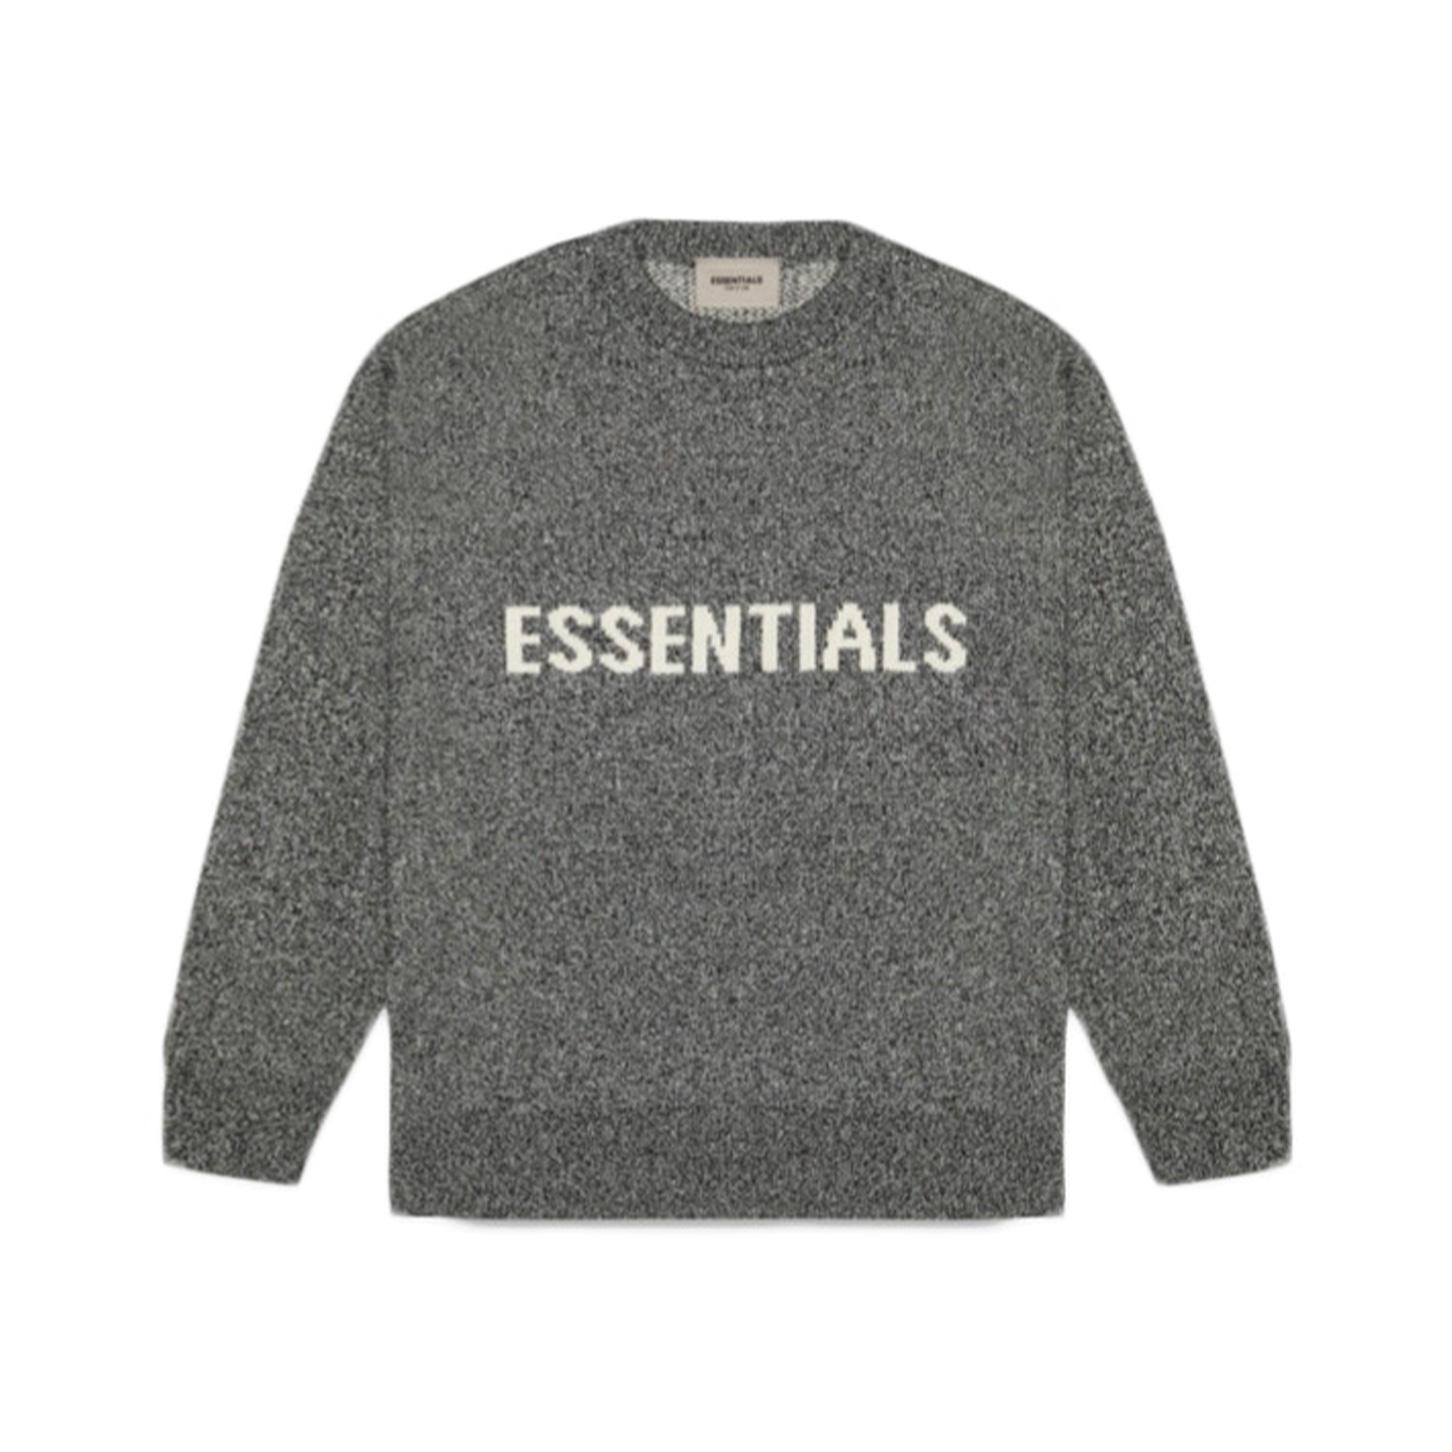 FEAR OF GOD ESSENTIALS Knit Sweater Grey Melange 20SS